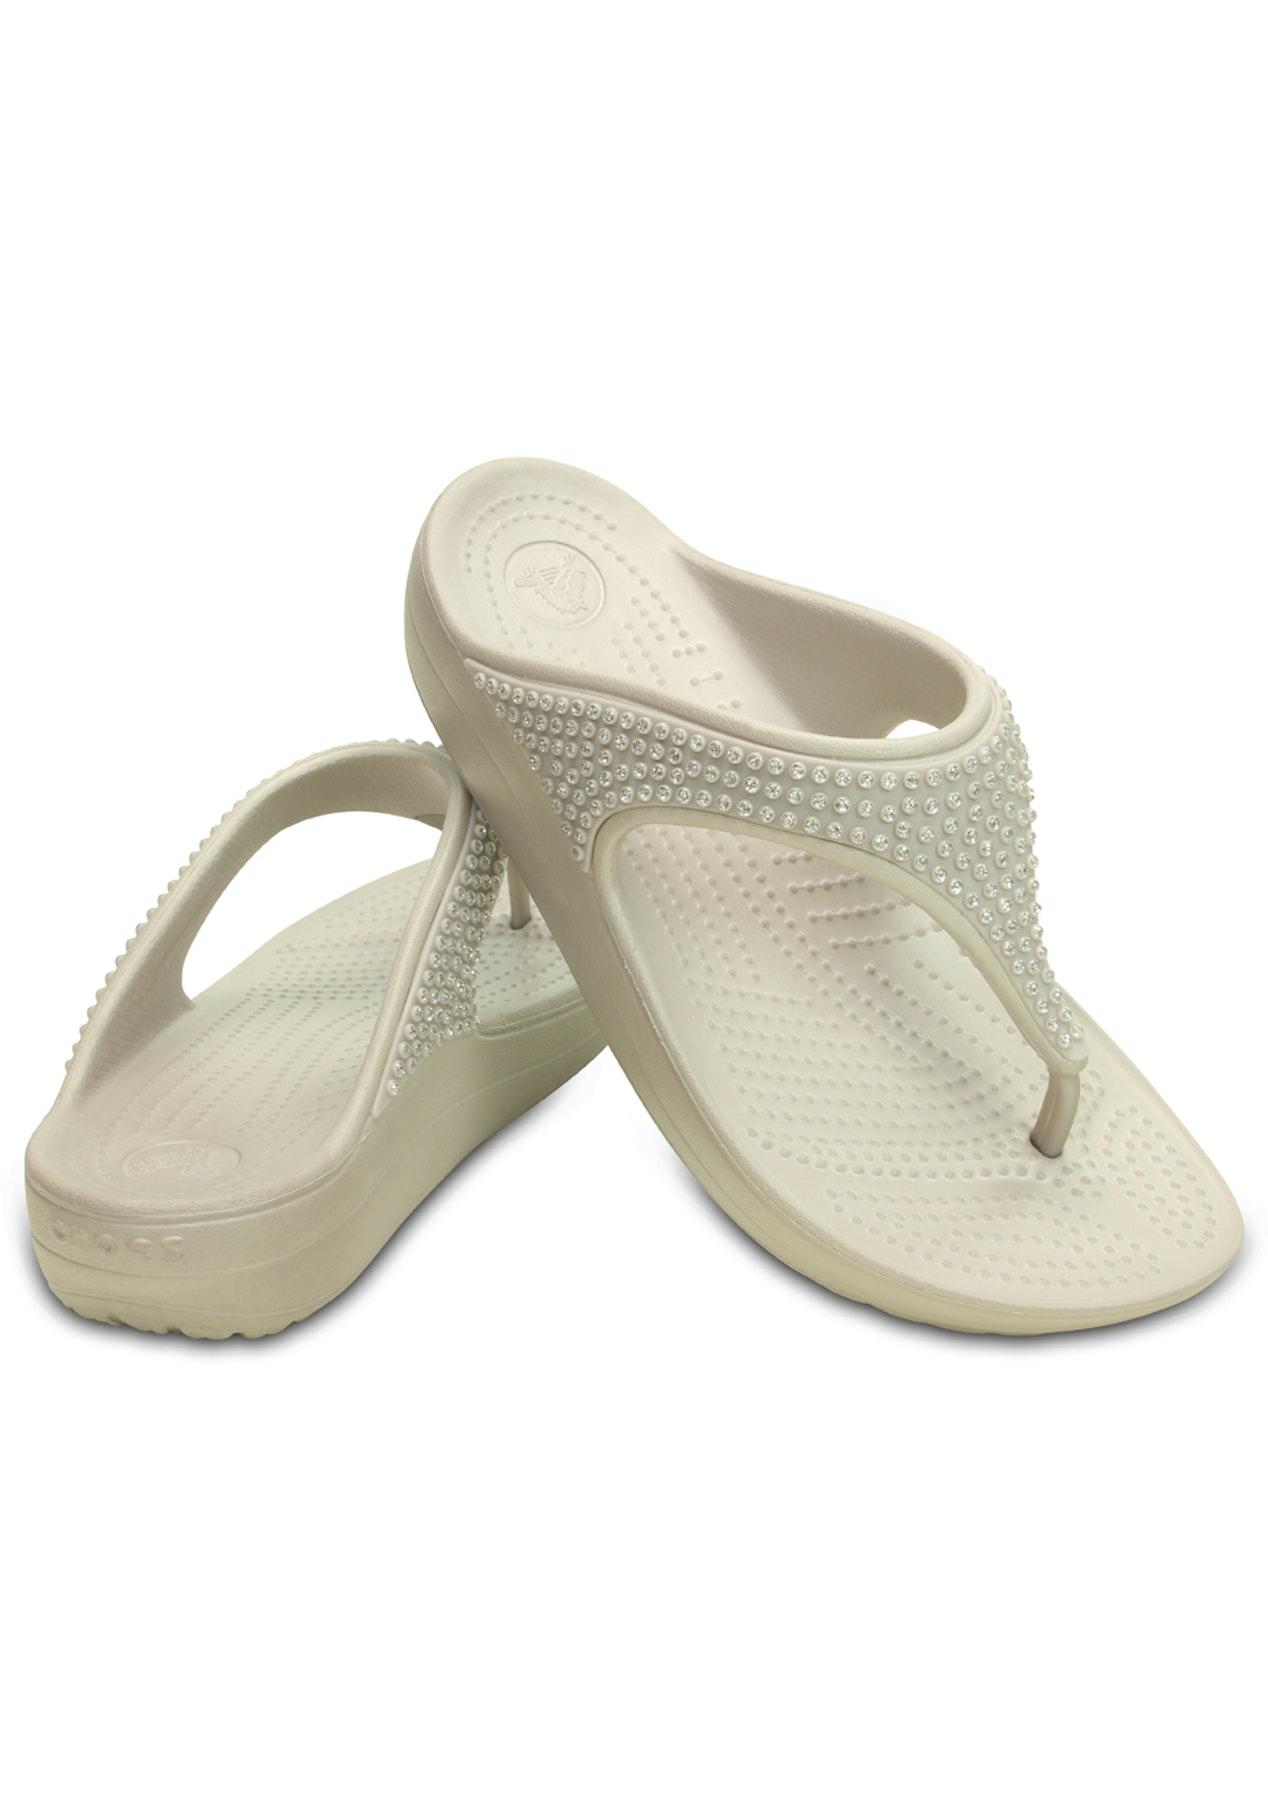 6552c5b5cdf4 CROCS - Womens Crocs Sloane Diamante Flip - Platnium - Crocs - Onceit